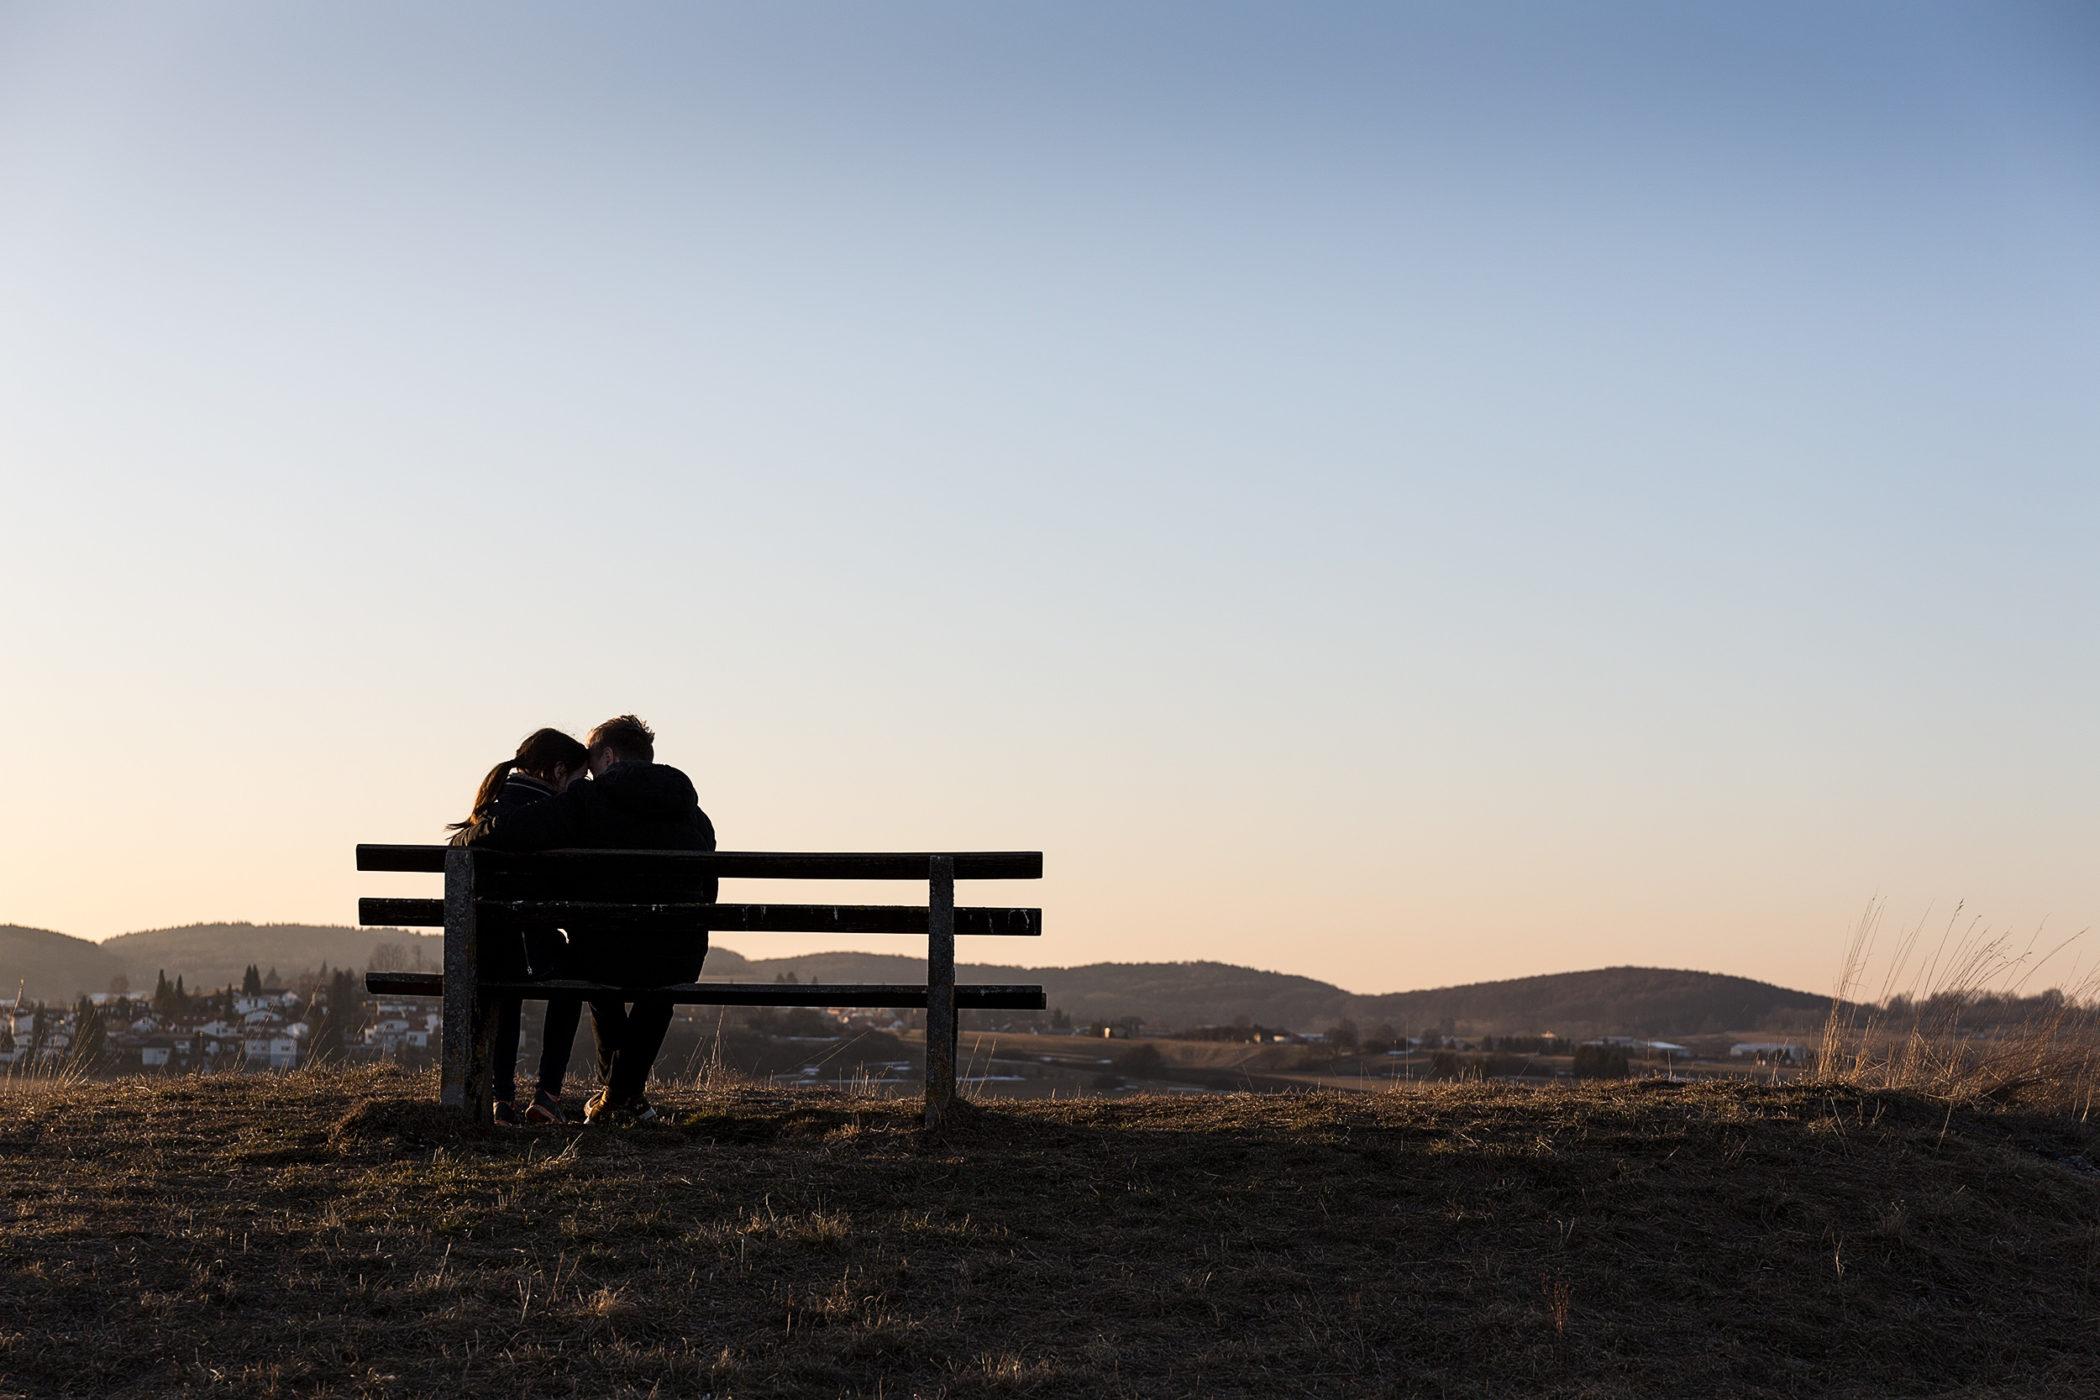 Liebespaar eng umschlungen auf Bank sitzend bei Sonnenbühl-Undingen.